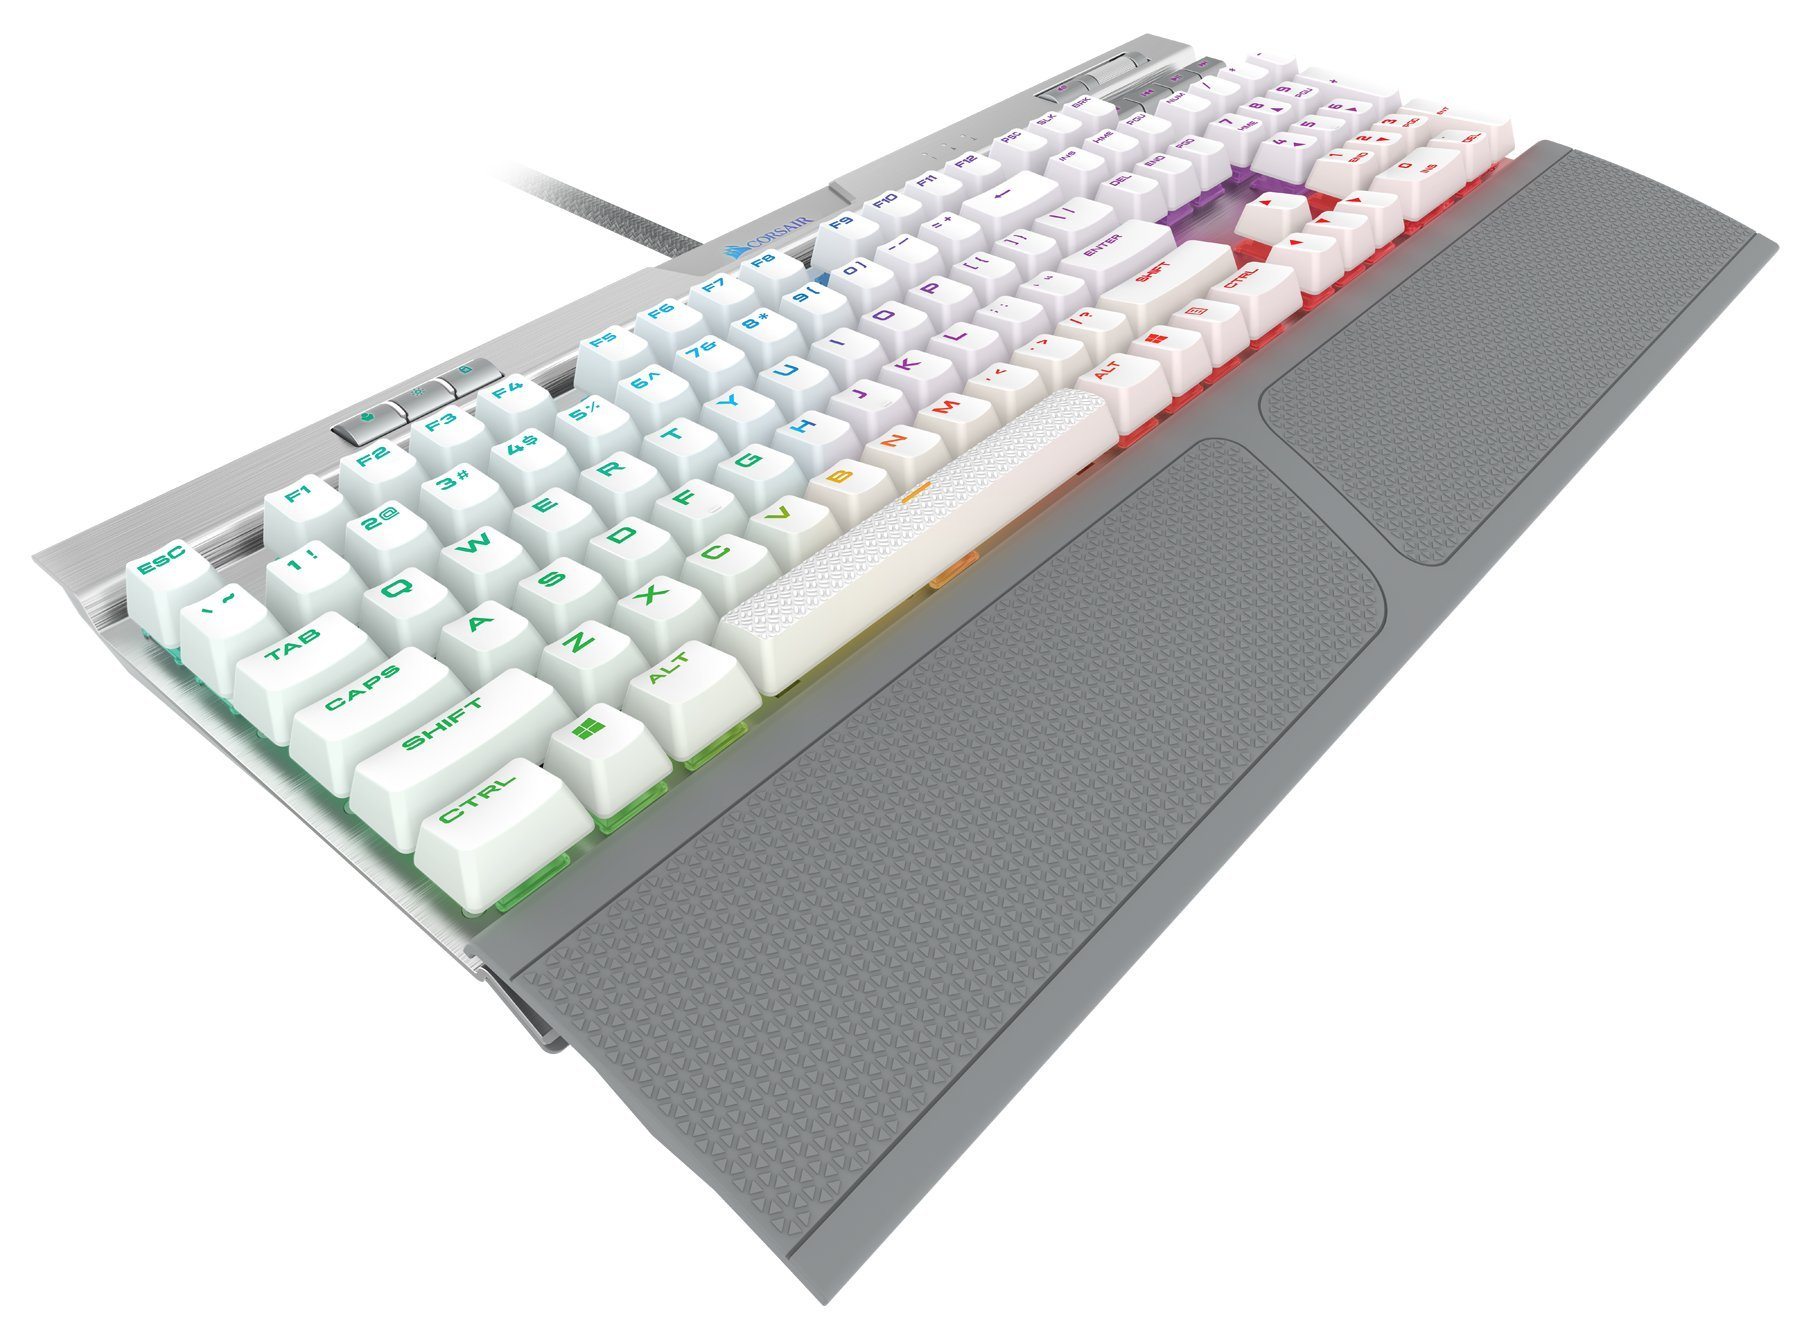 CORSAIR K70 RGB MK.2 SE Mechanical RAPIDFIRE Gaming Keyboard - USB Passthrough & Media Controls - PBT Double-Shot Keycaps - Cherry MX Speed - RGB LED Backlit